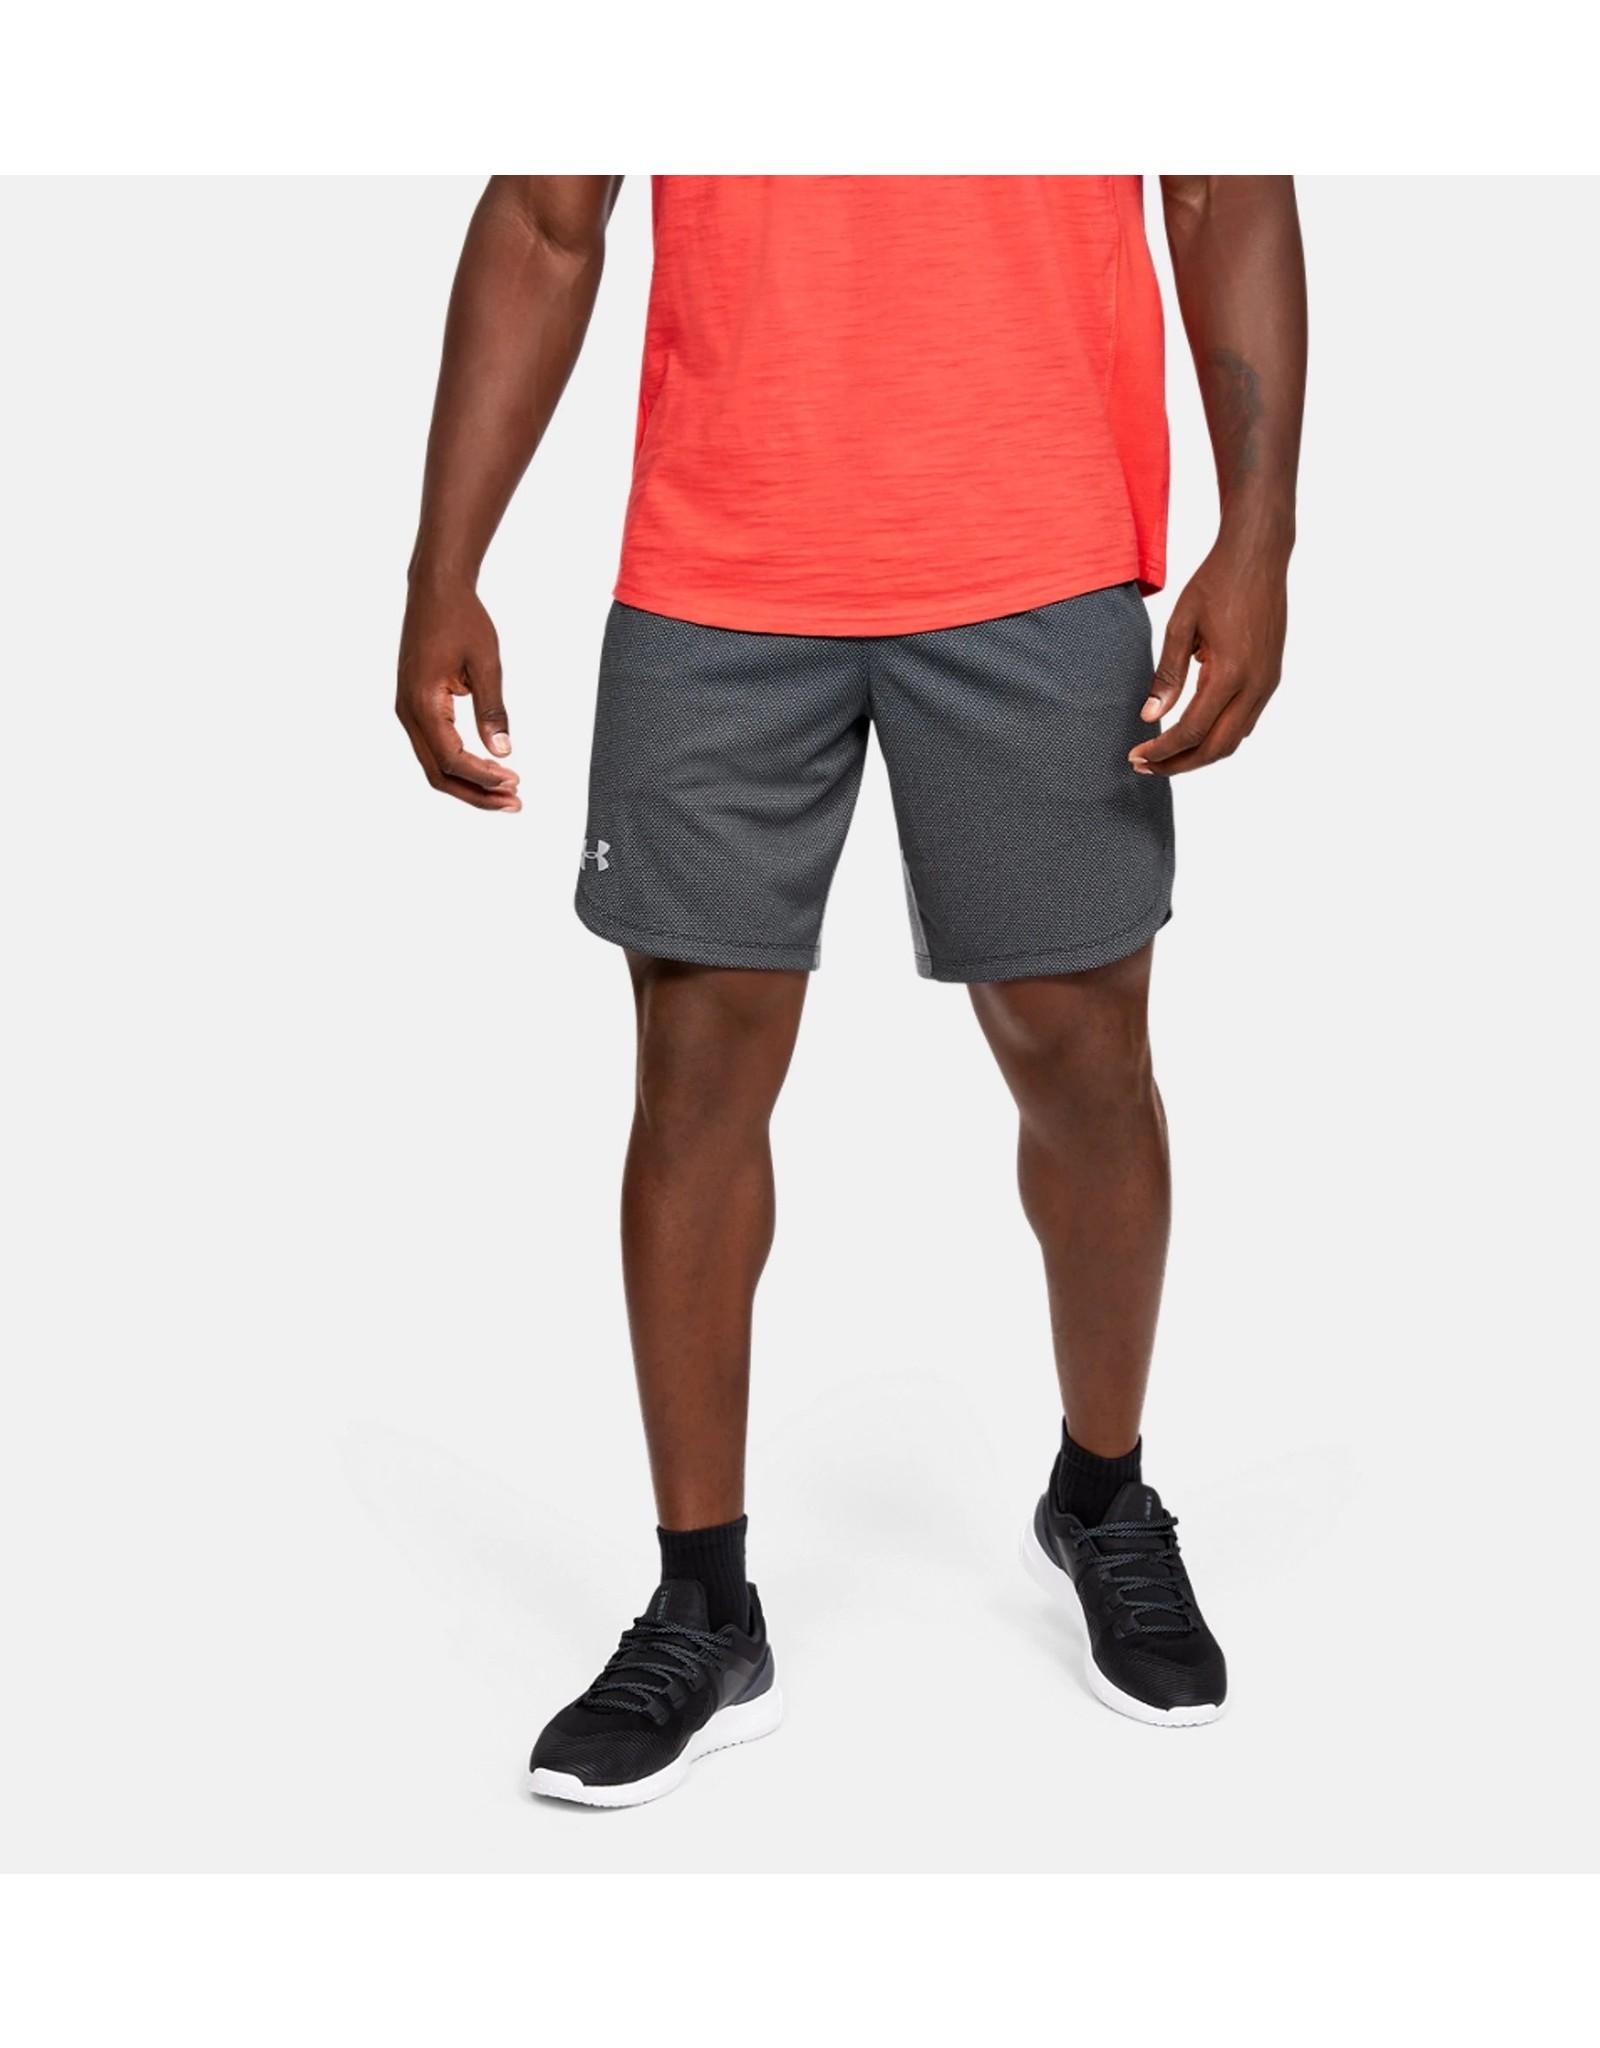 Under Armour Knit Training Shorts - dark grey